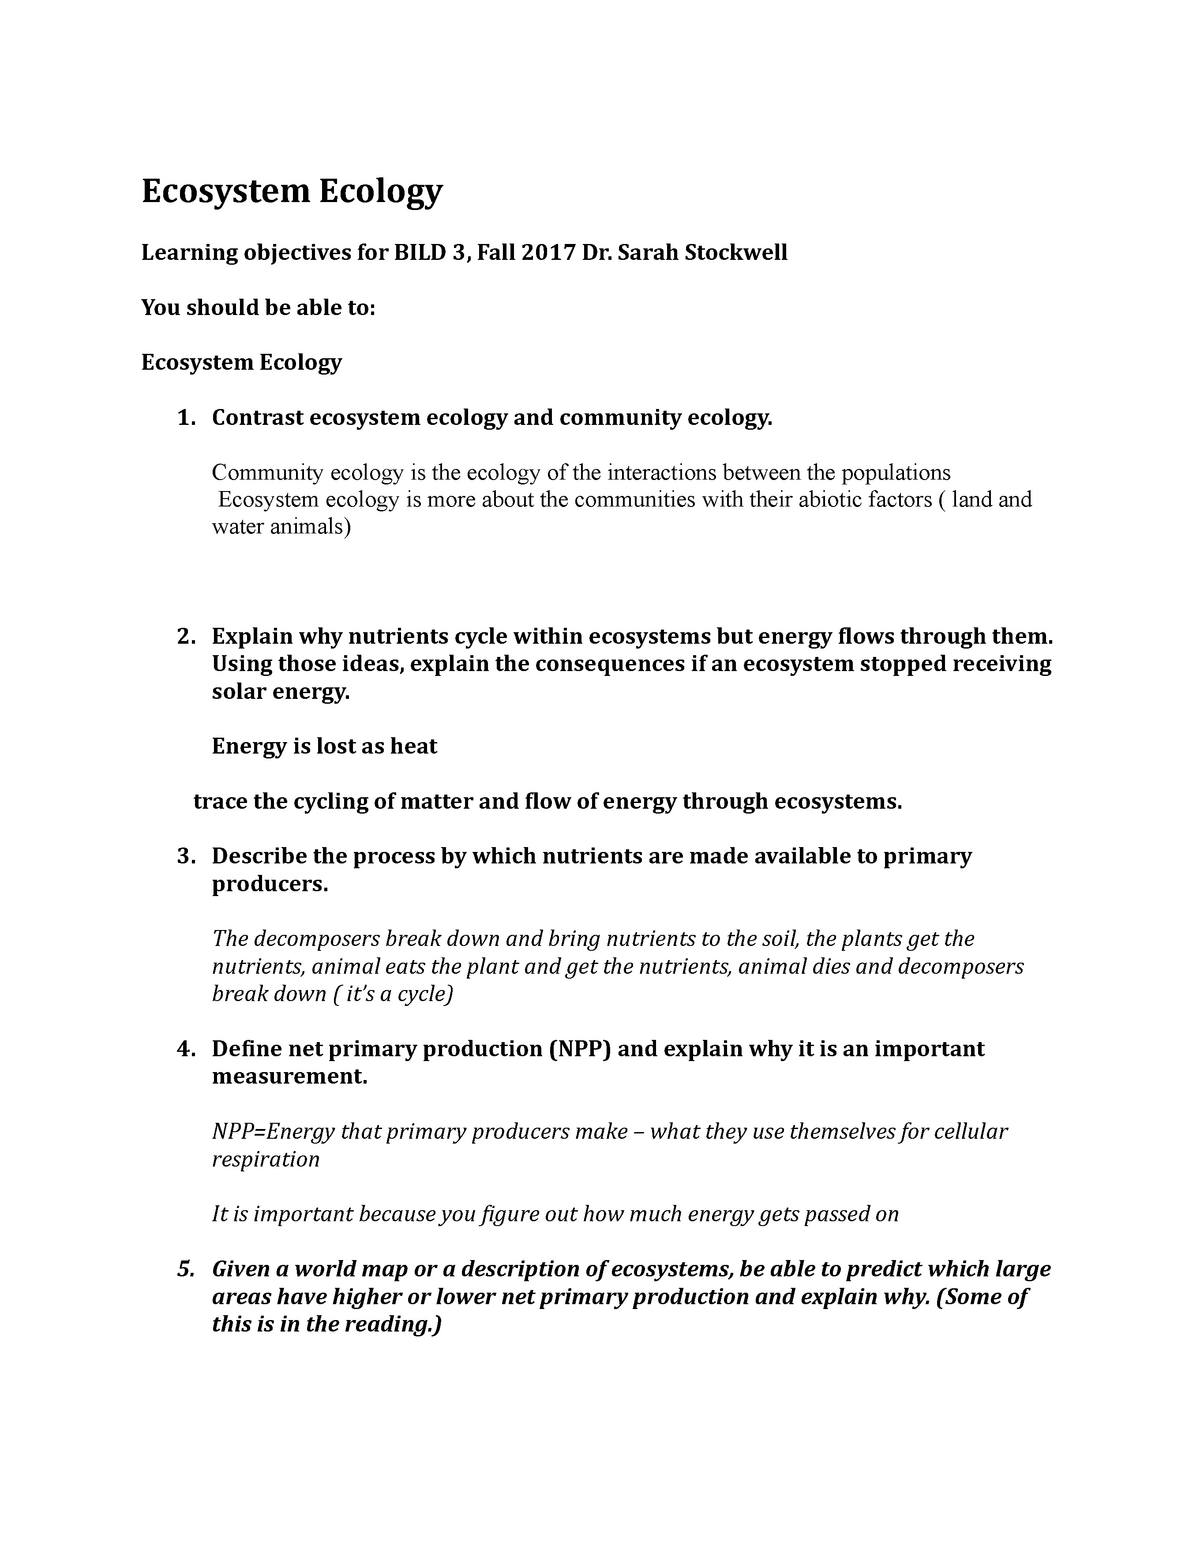 Learning Objective -15  Ecosystem Ecology - BILD 3 - StuDocu